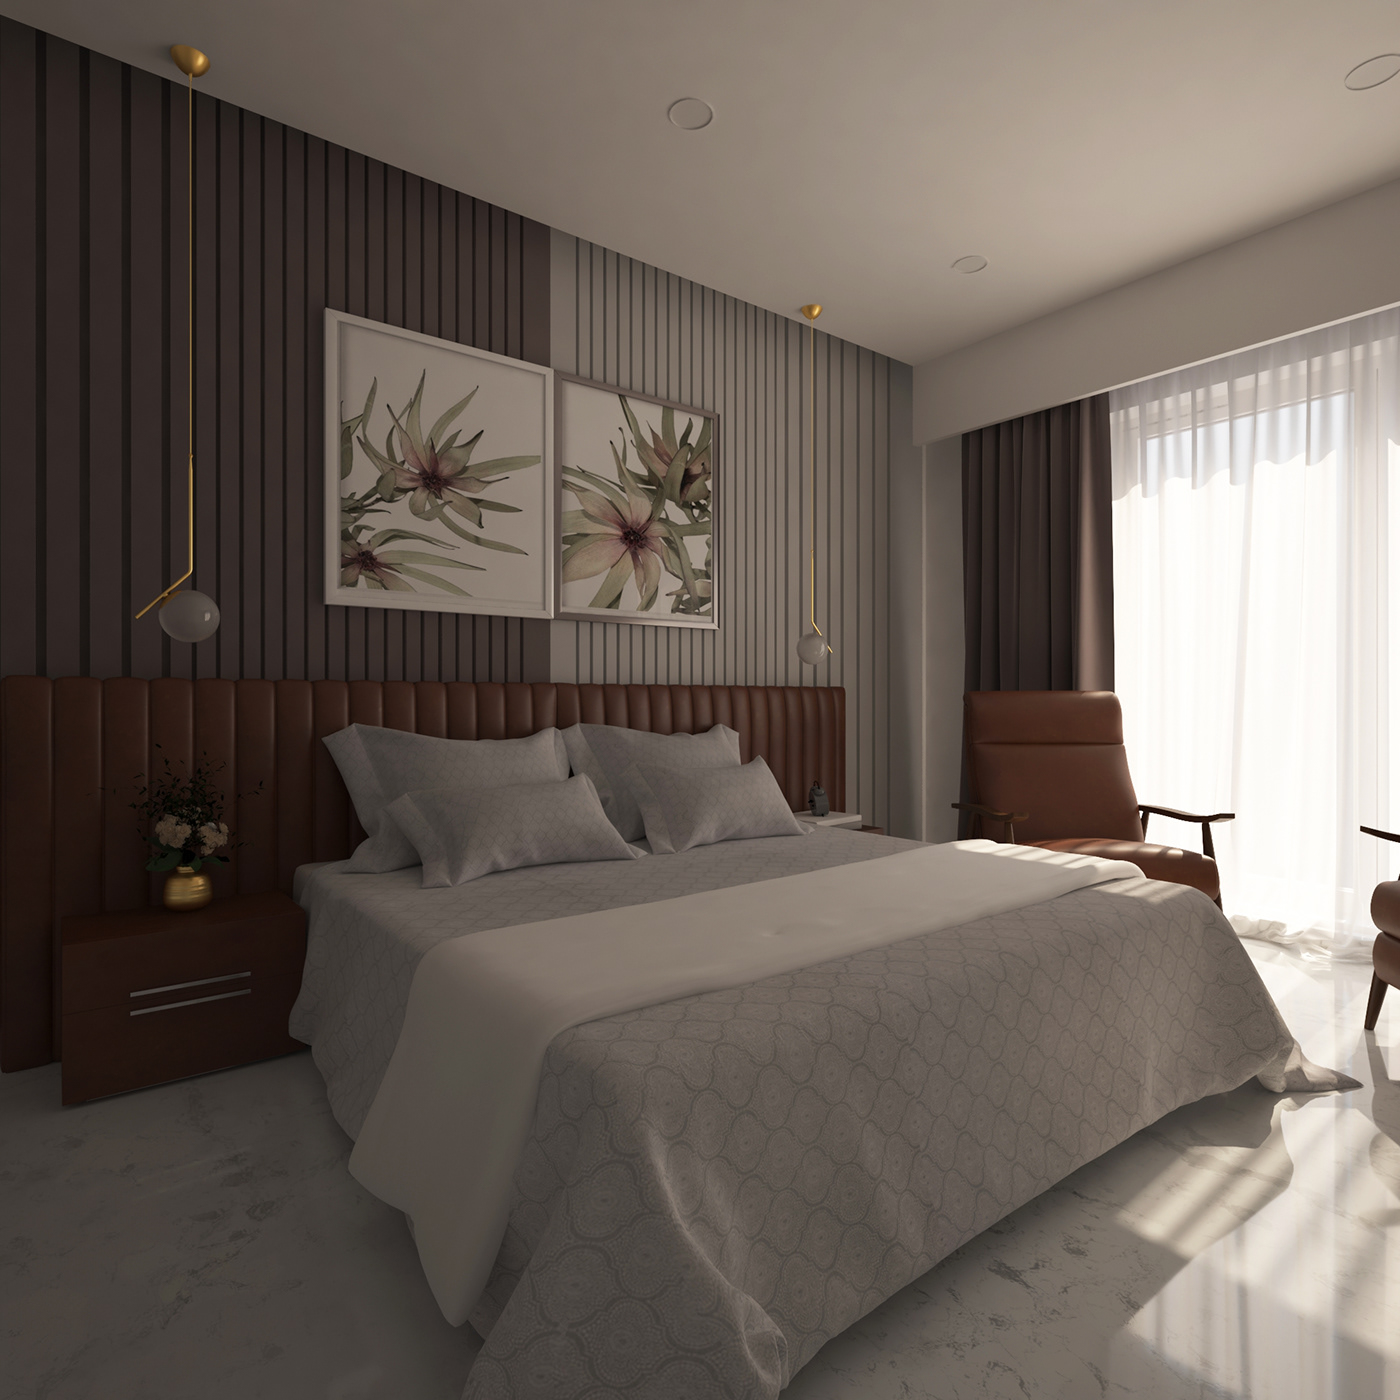 3D,3dsmax,architecture,bedroom,design,Interior,lighting,Render,vray